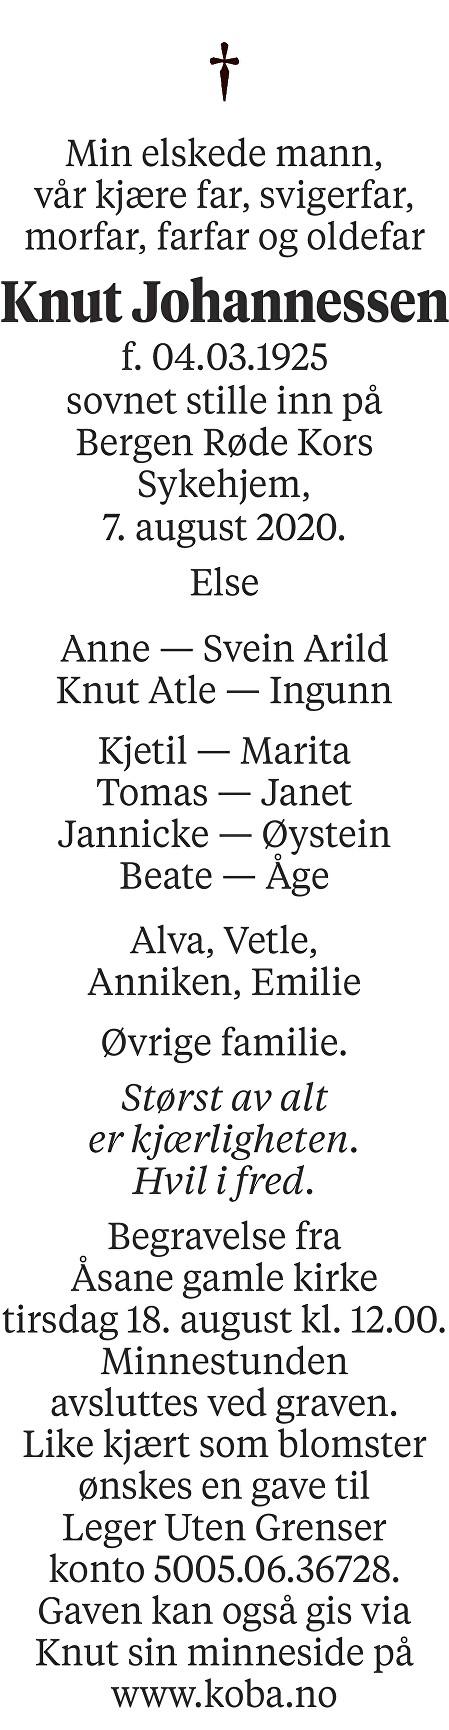 Knut Johannessen Dødsannonse